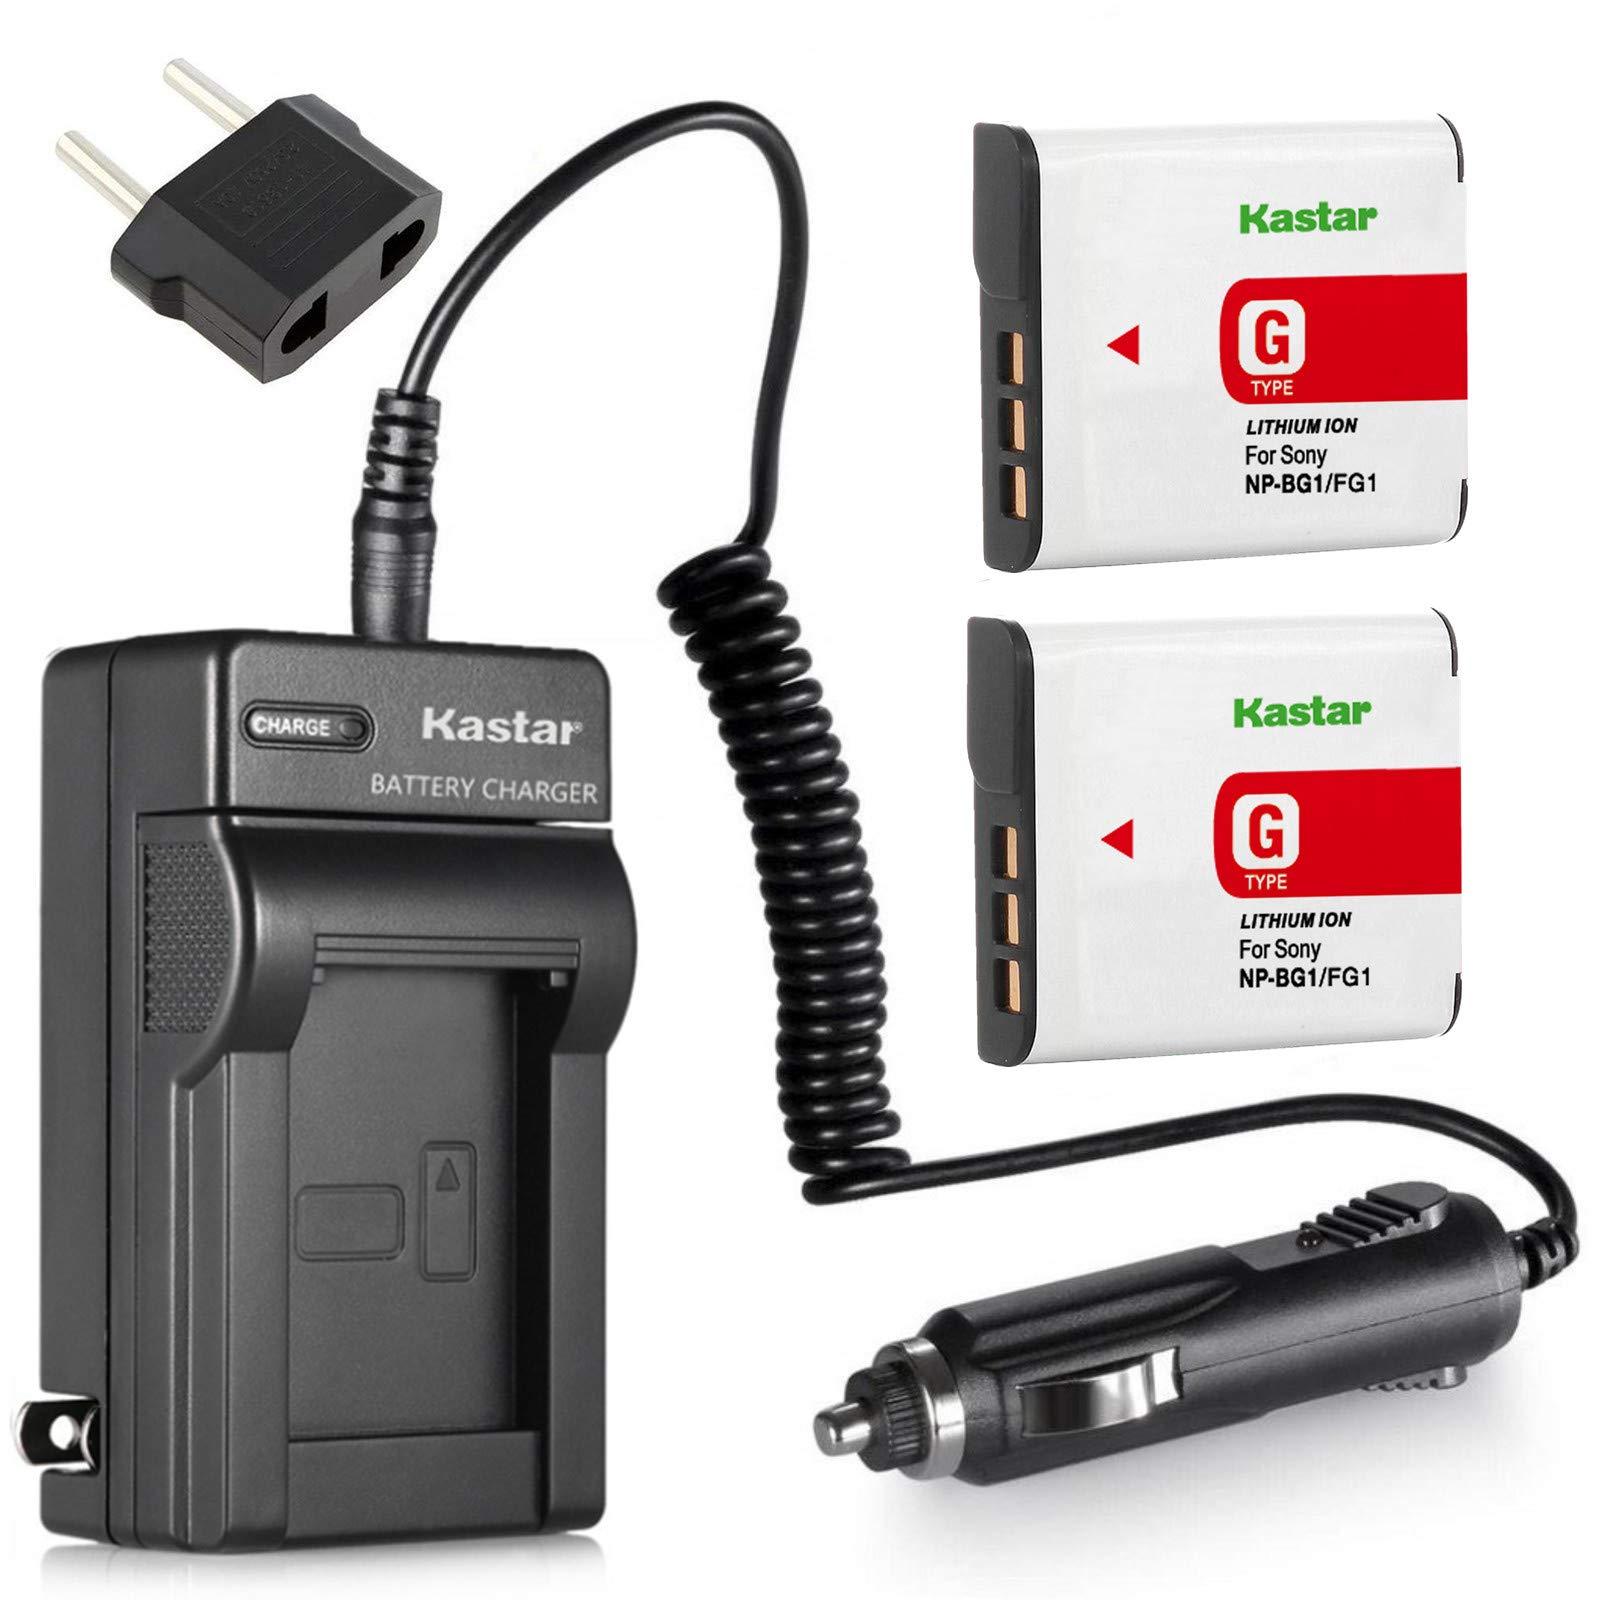 Kastar Battery (2-Pack) and Charger for Sony NP-BG1, NP-FG1 and Cyber-shot DSC-W120, W220, W150, DSC-H3, DSC-H7, DSC-H9, DSC-H10, DSC-H20, DSC-H50, DSC-H55, DSC-H70, DSC-HX5V, HX7V, HX9V, HX10V, HX30V